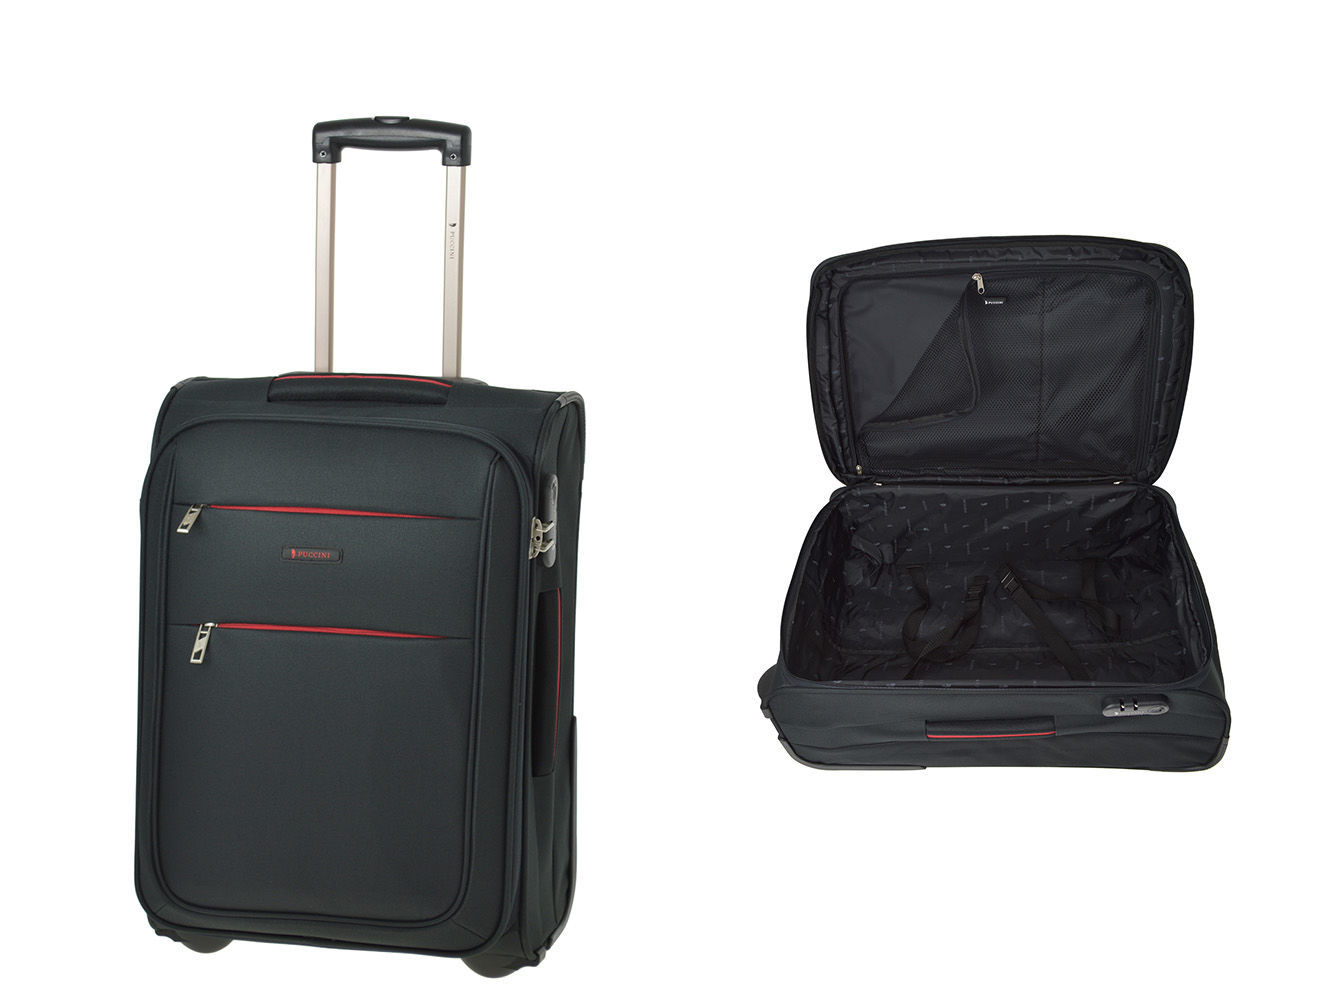 fee799ae3ca05 Puccini Camerino EM50307C mała walizka Ryanair 24h - 6977910885 ...